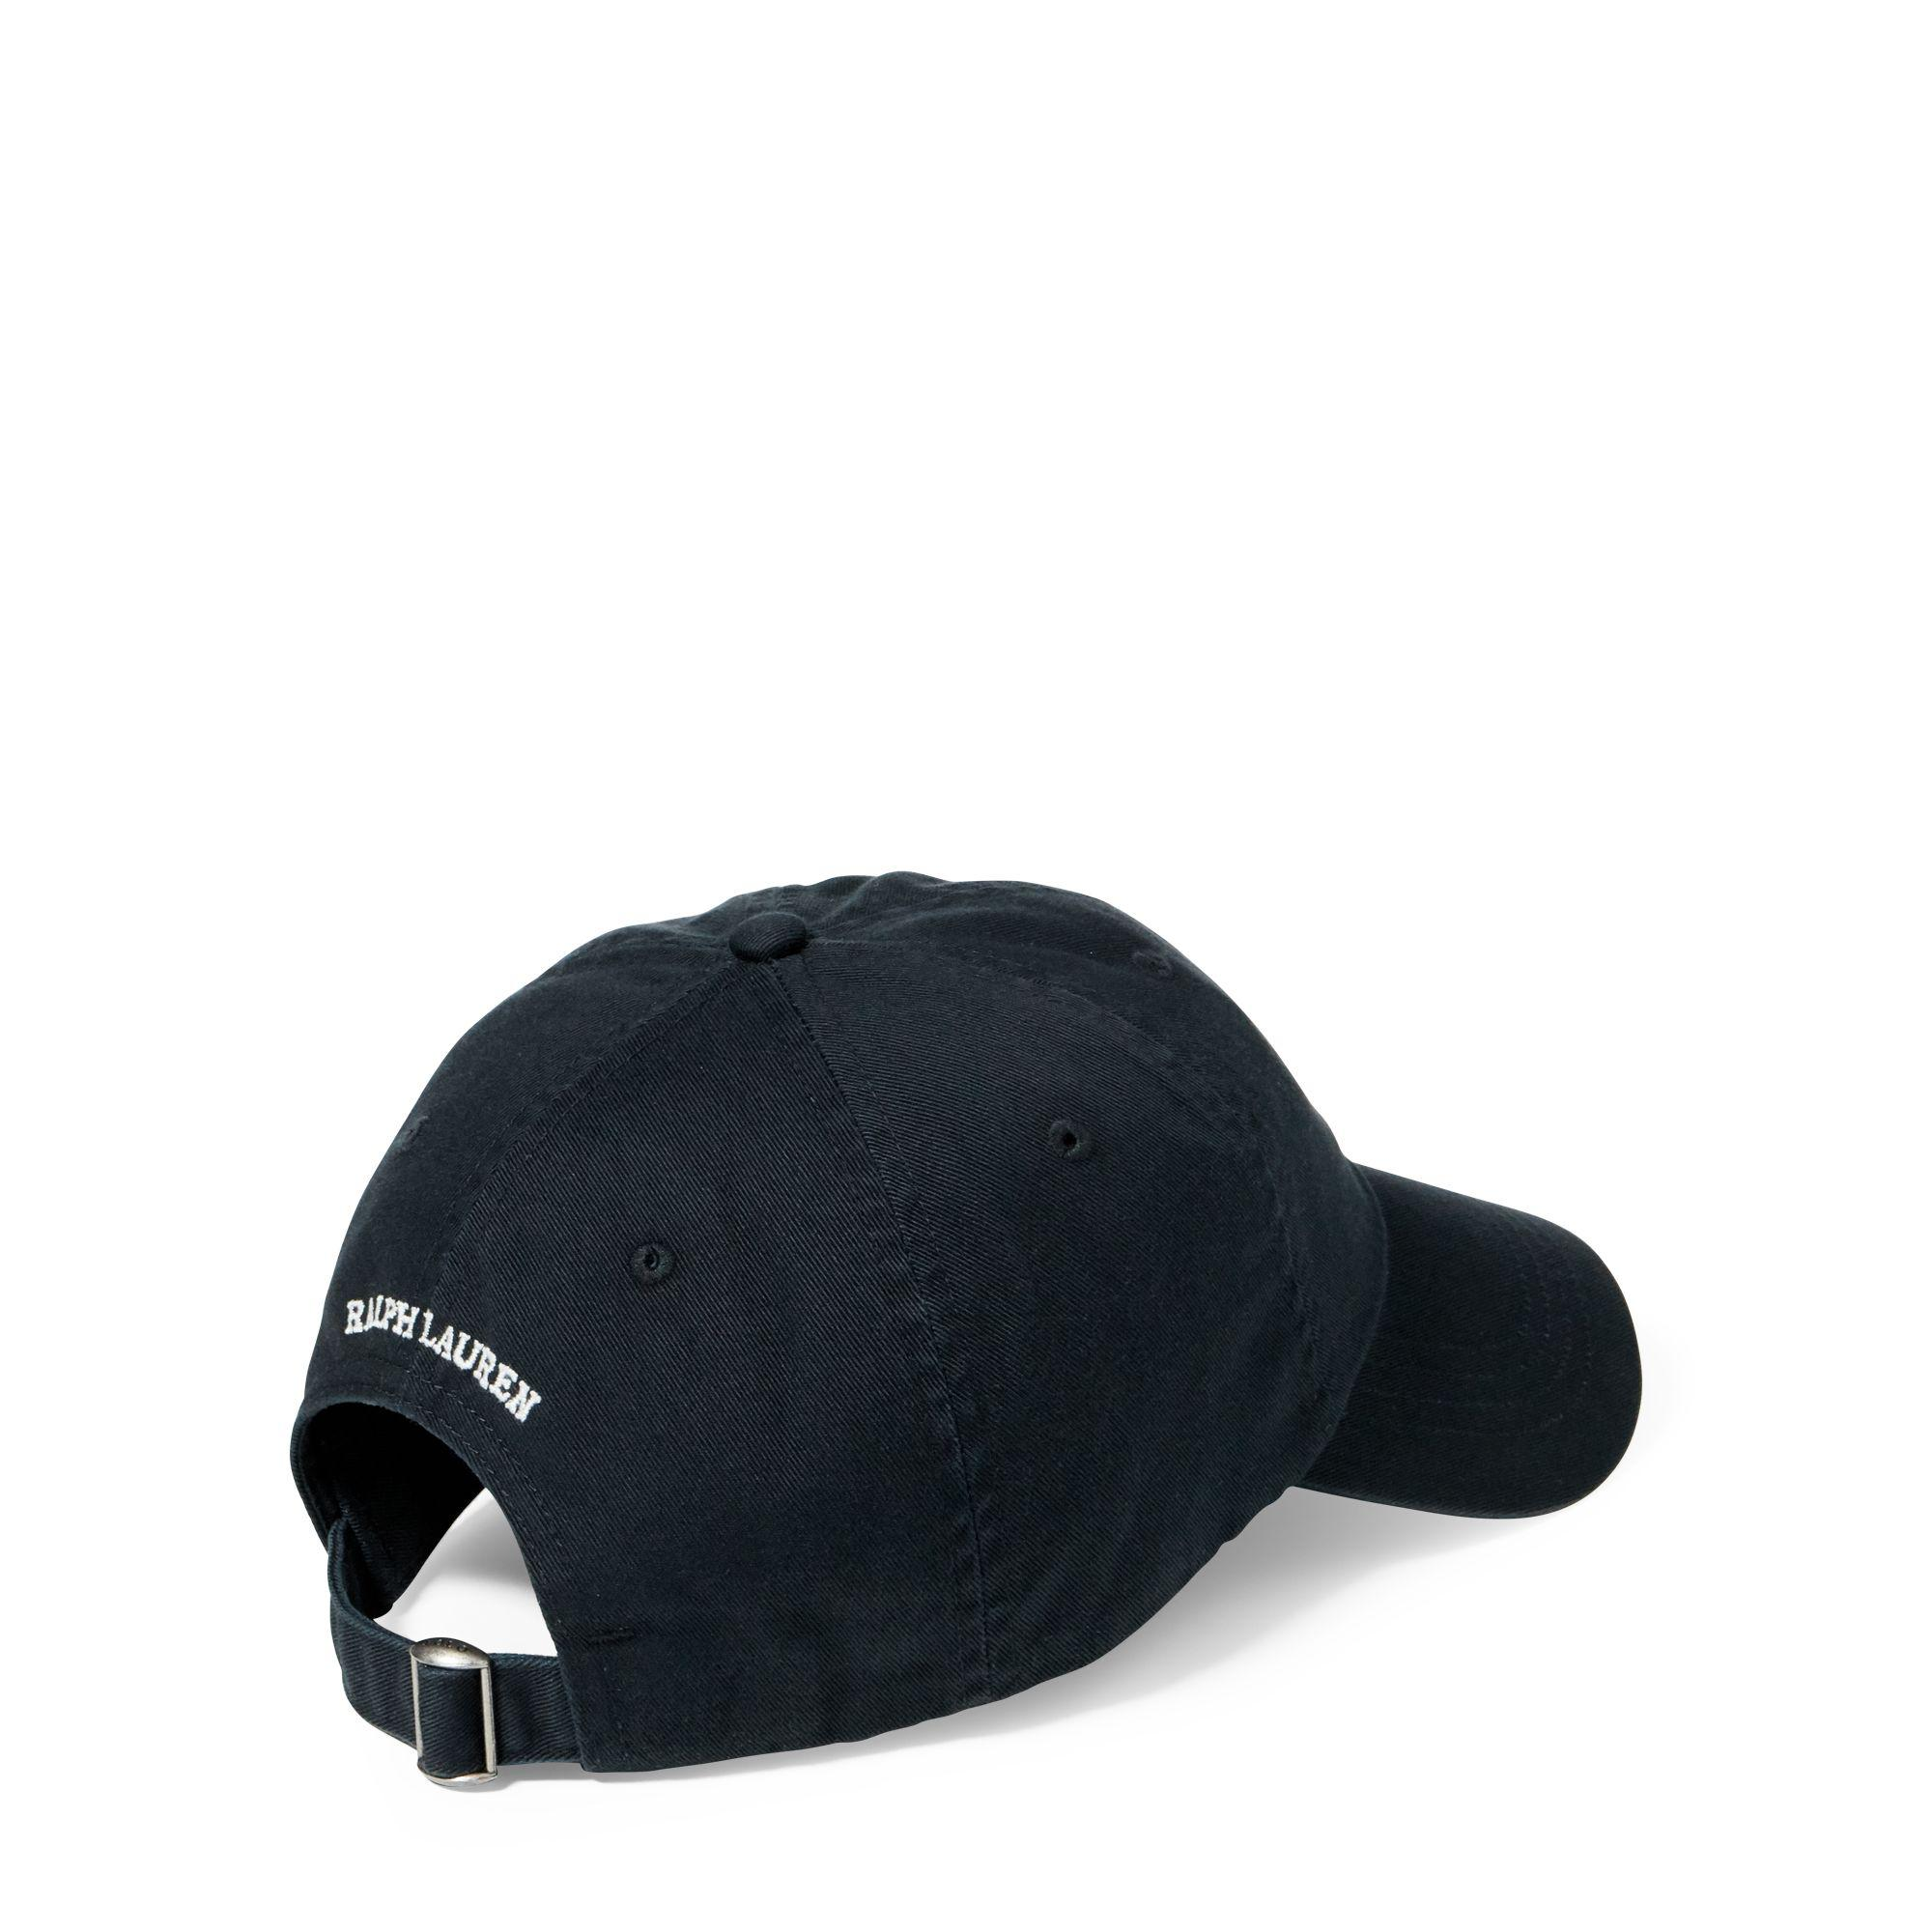 Polo Ralph Lauren Martini Polo Bear Chino Cap in Black for Men - Lyst bd8b288bf32b